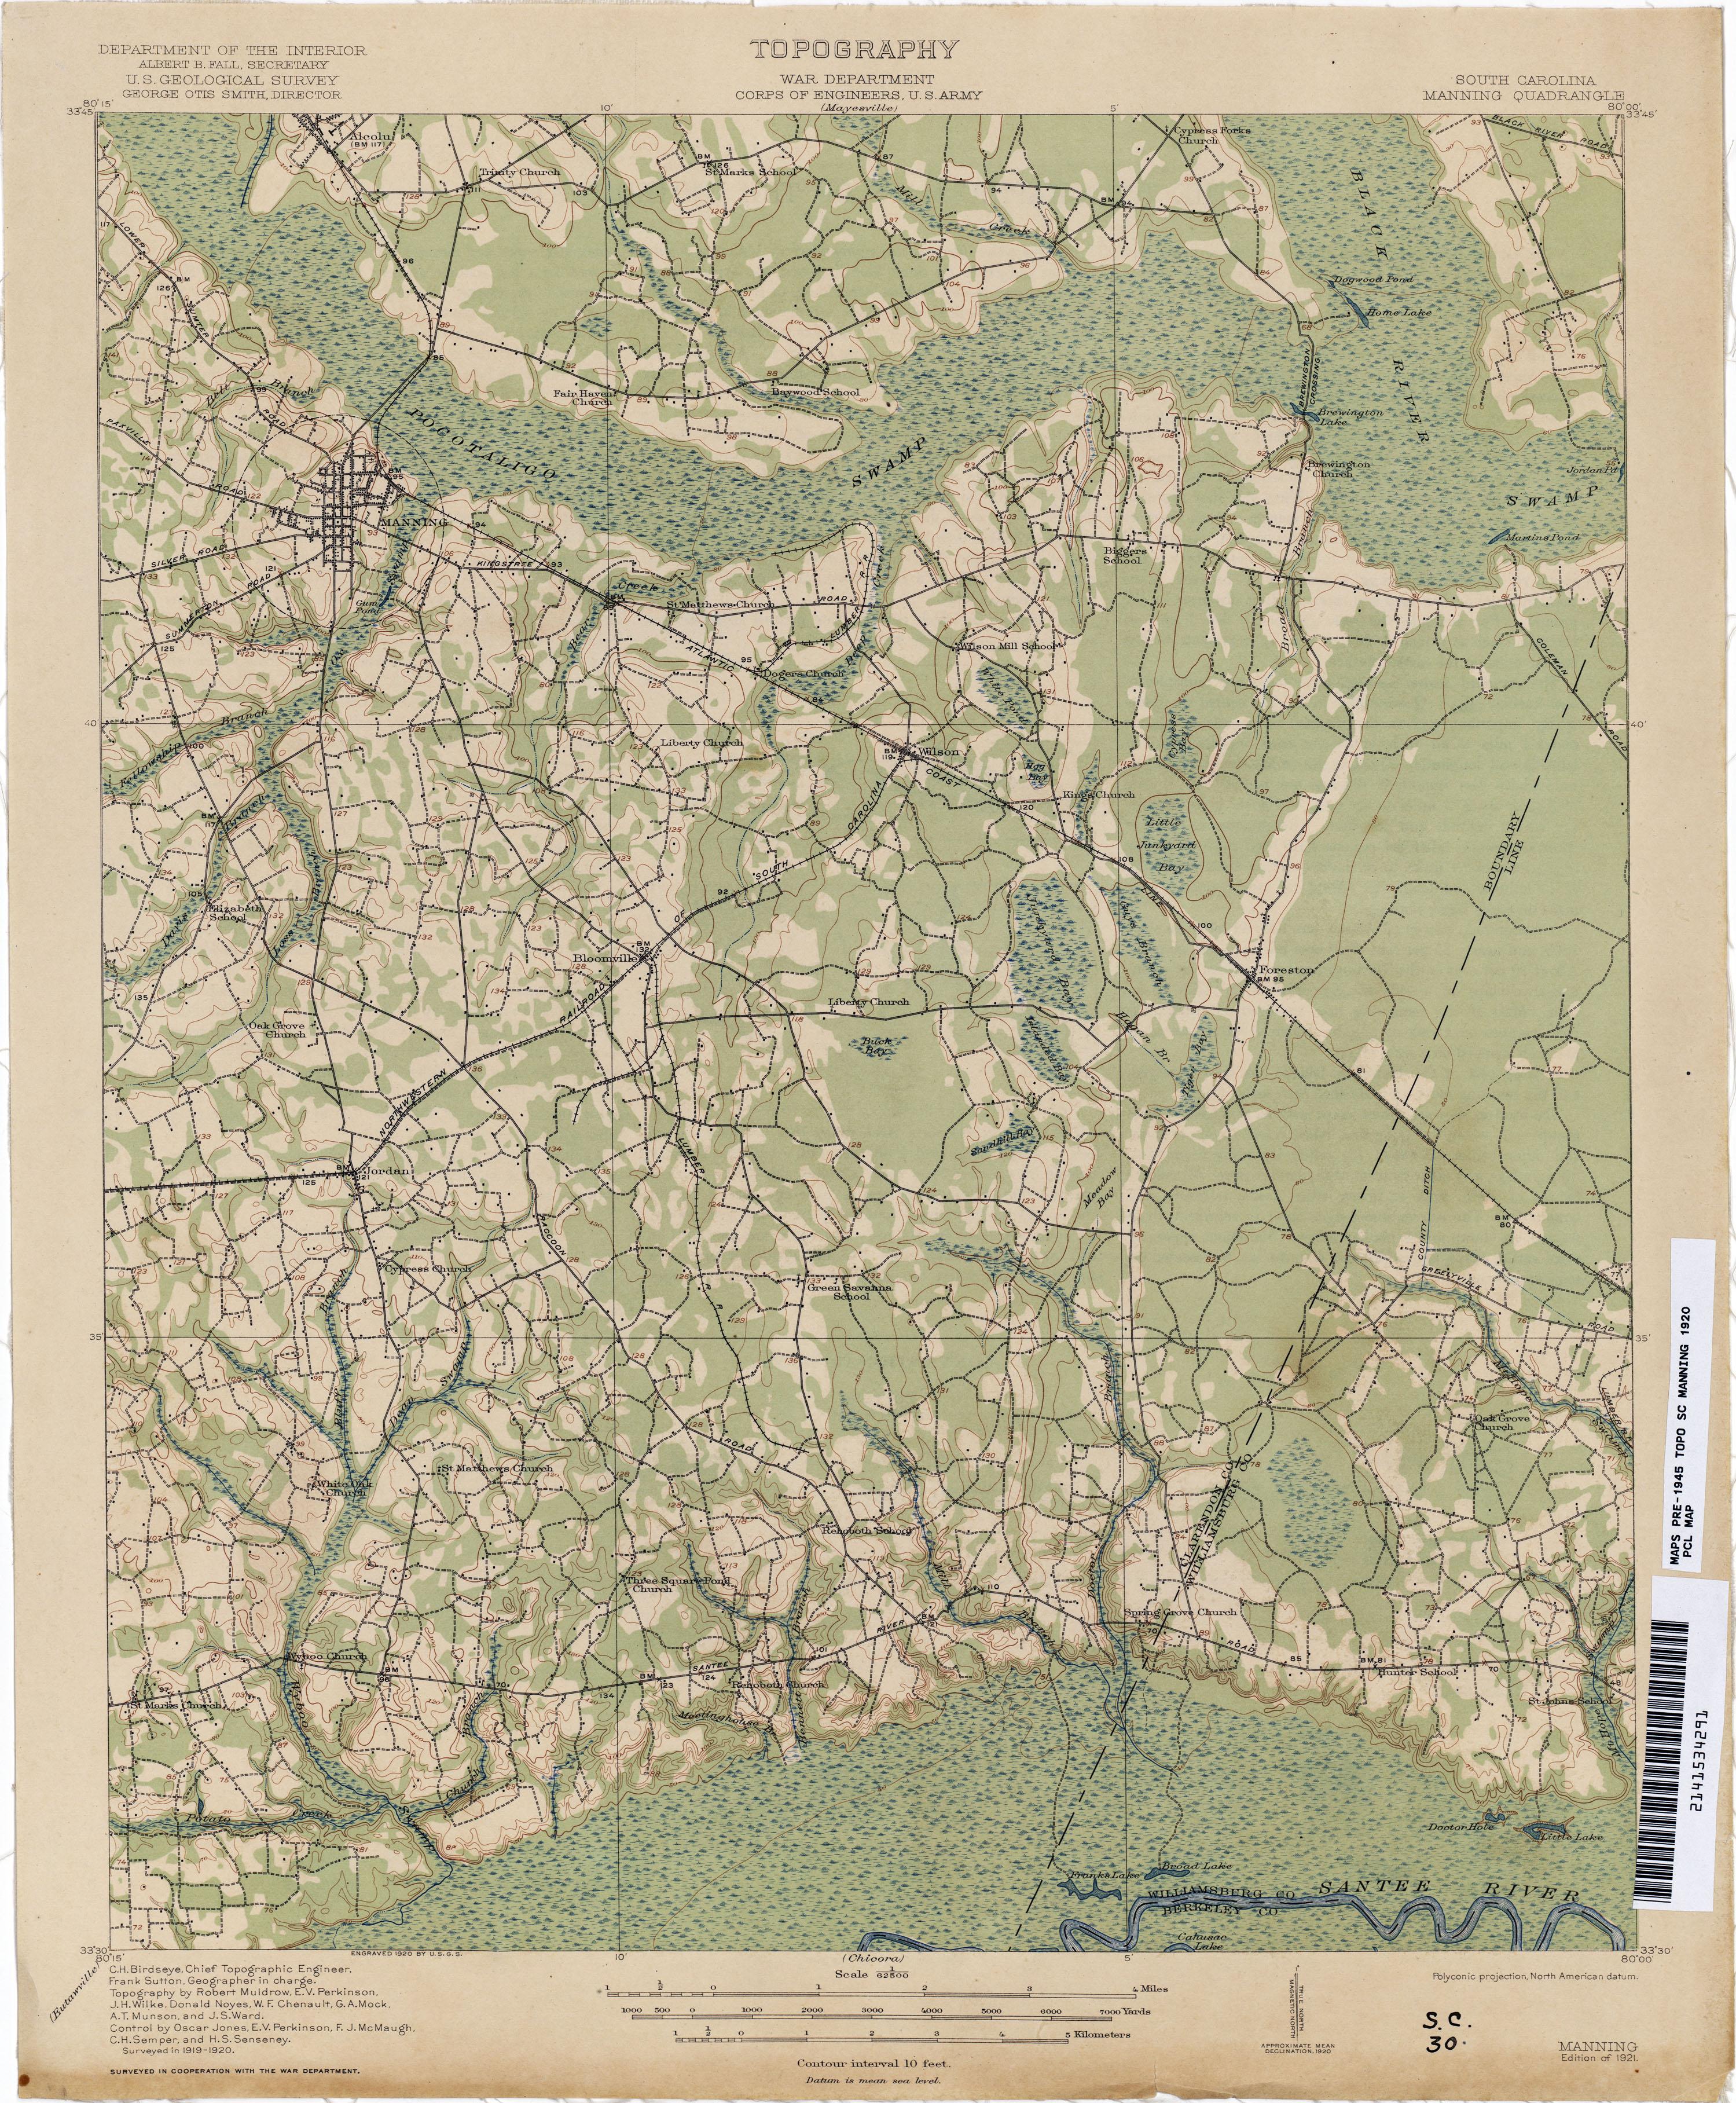 South Carolina Historical Topographic Maps PerryCastañeda Map - China historical map 1890 1907